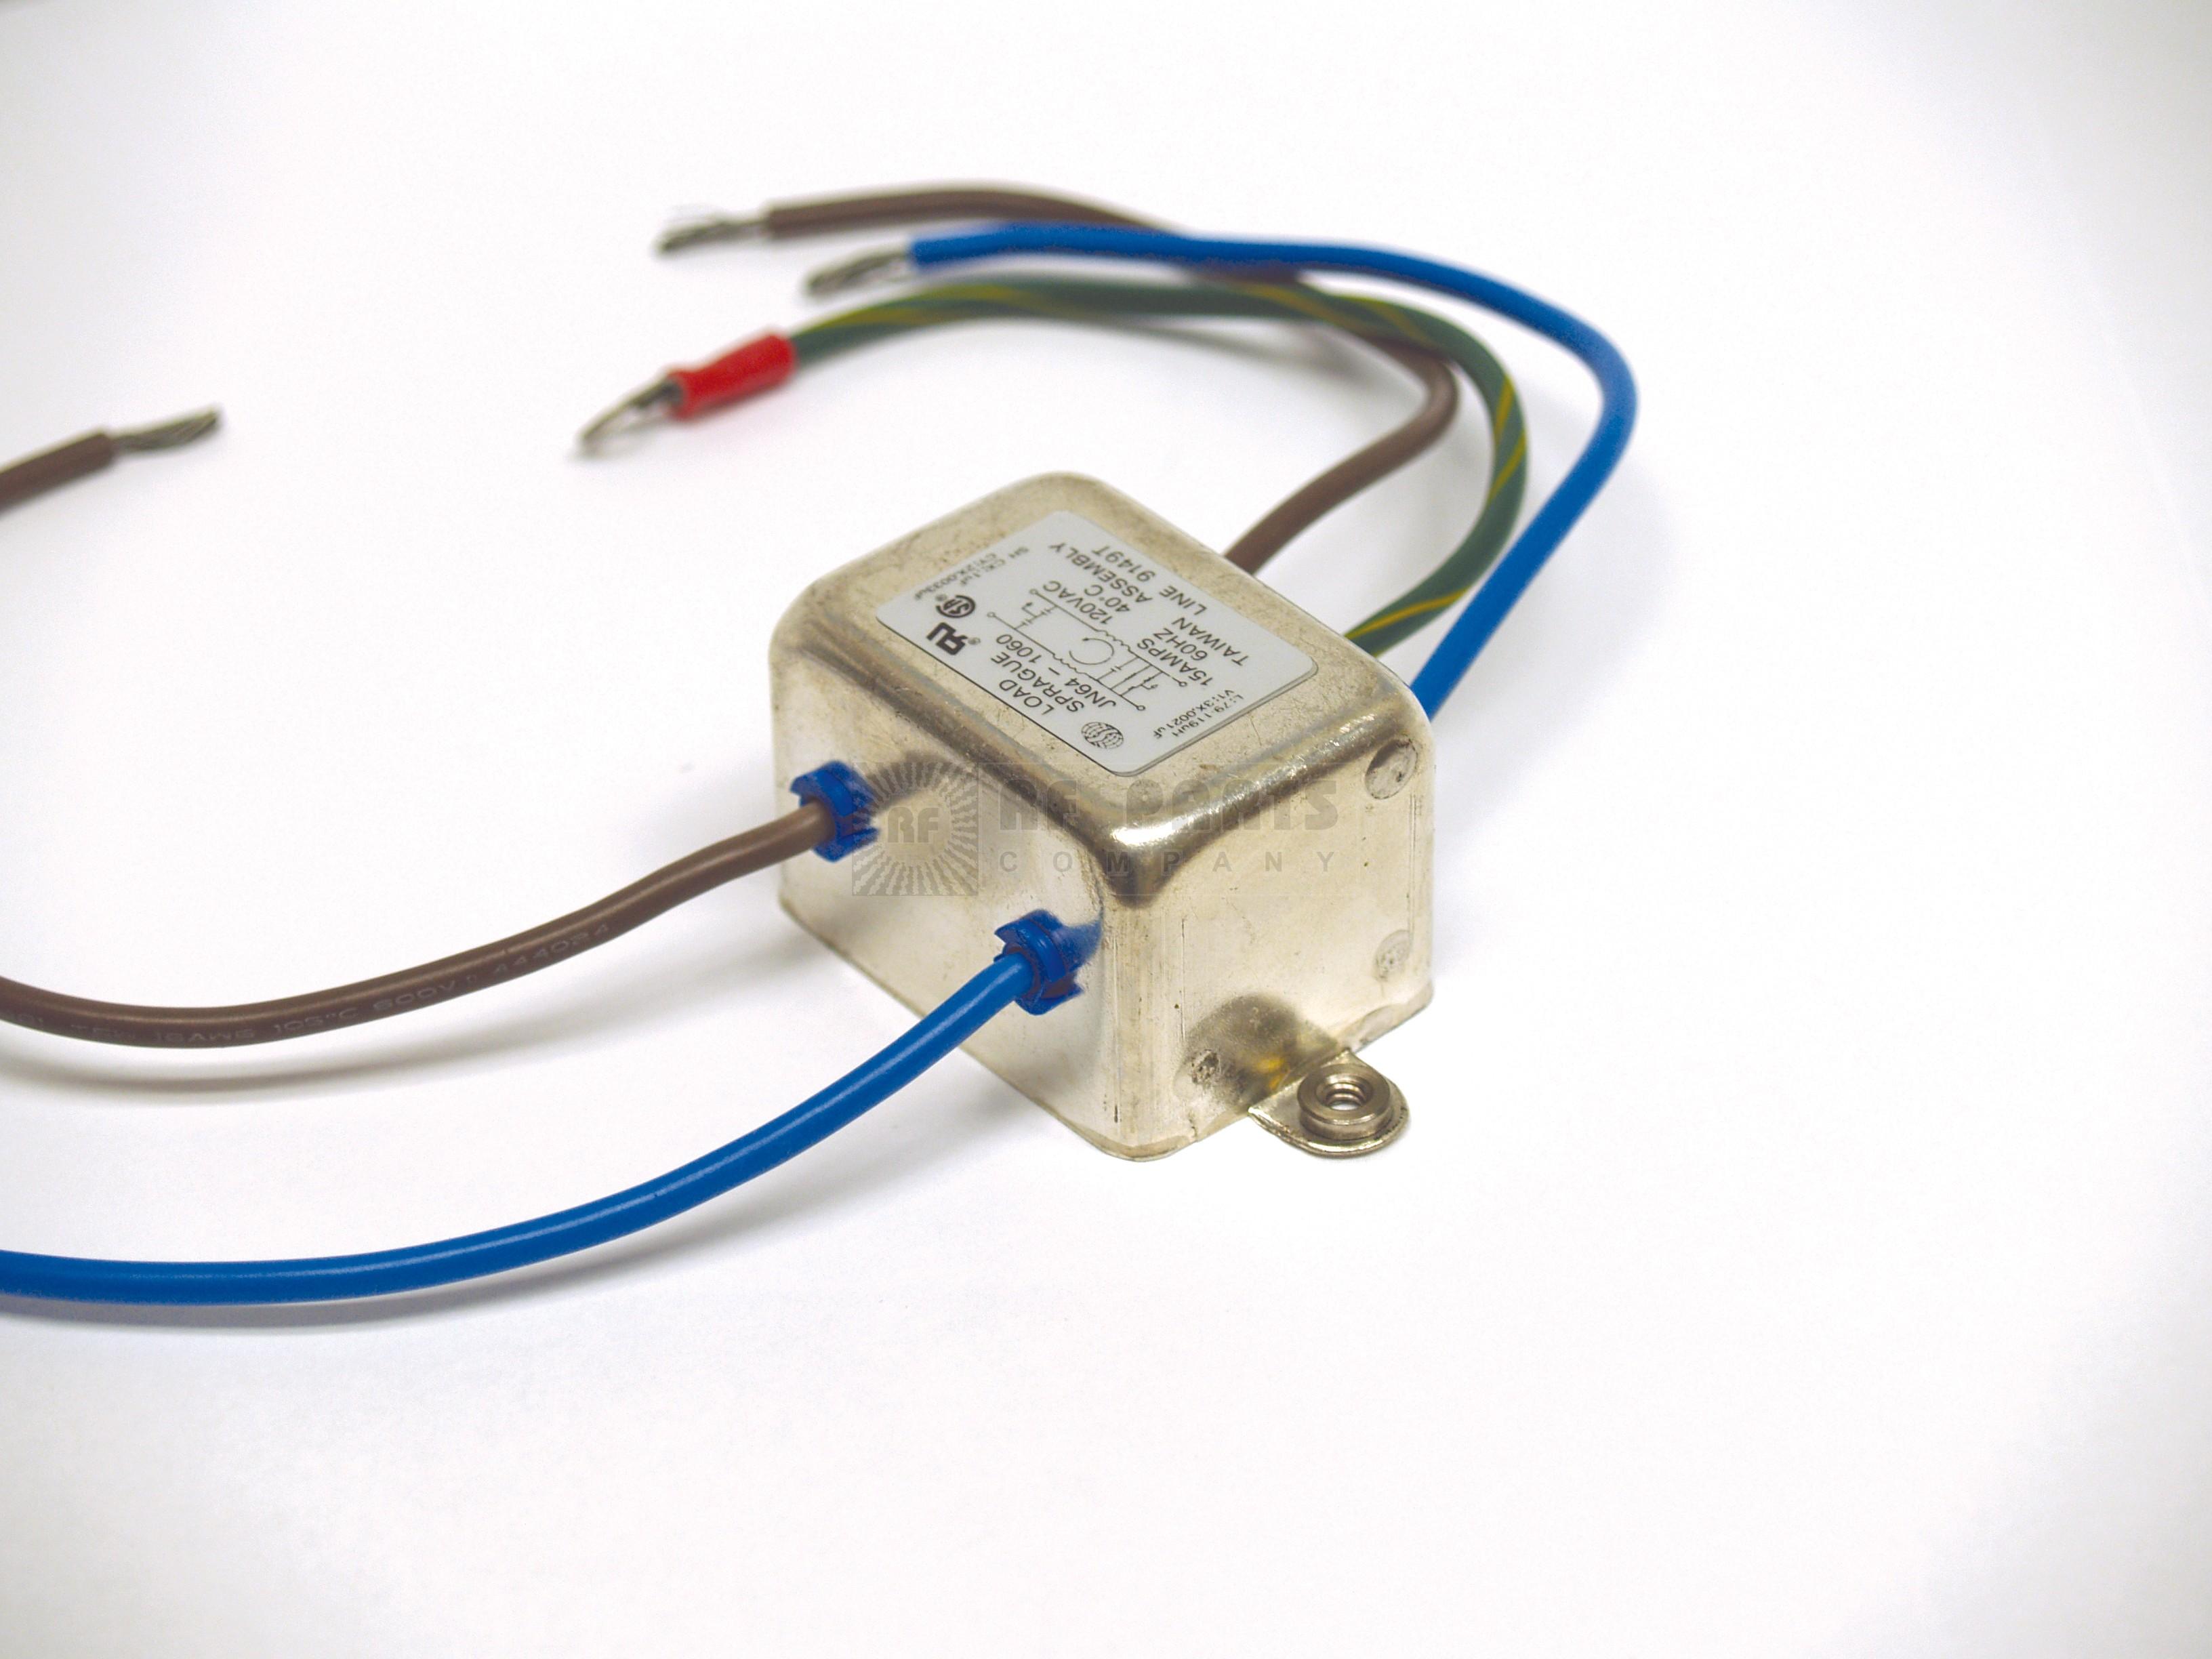 JN64-1060 Emi filter